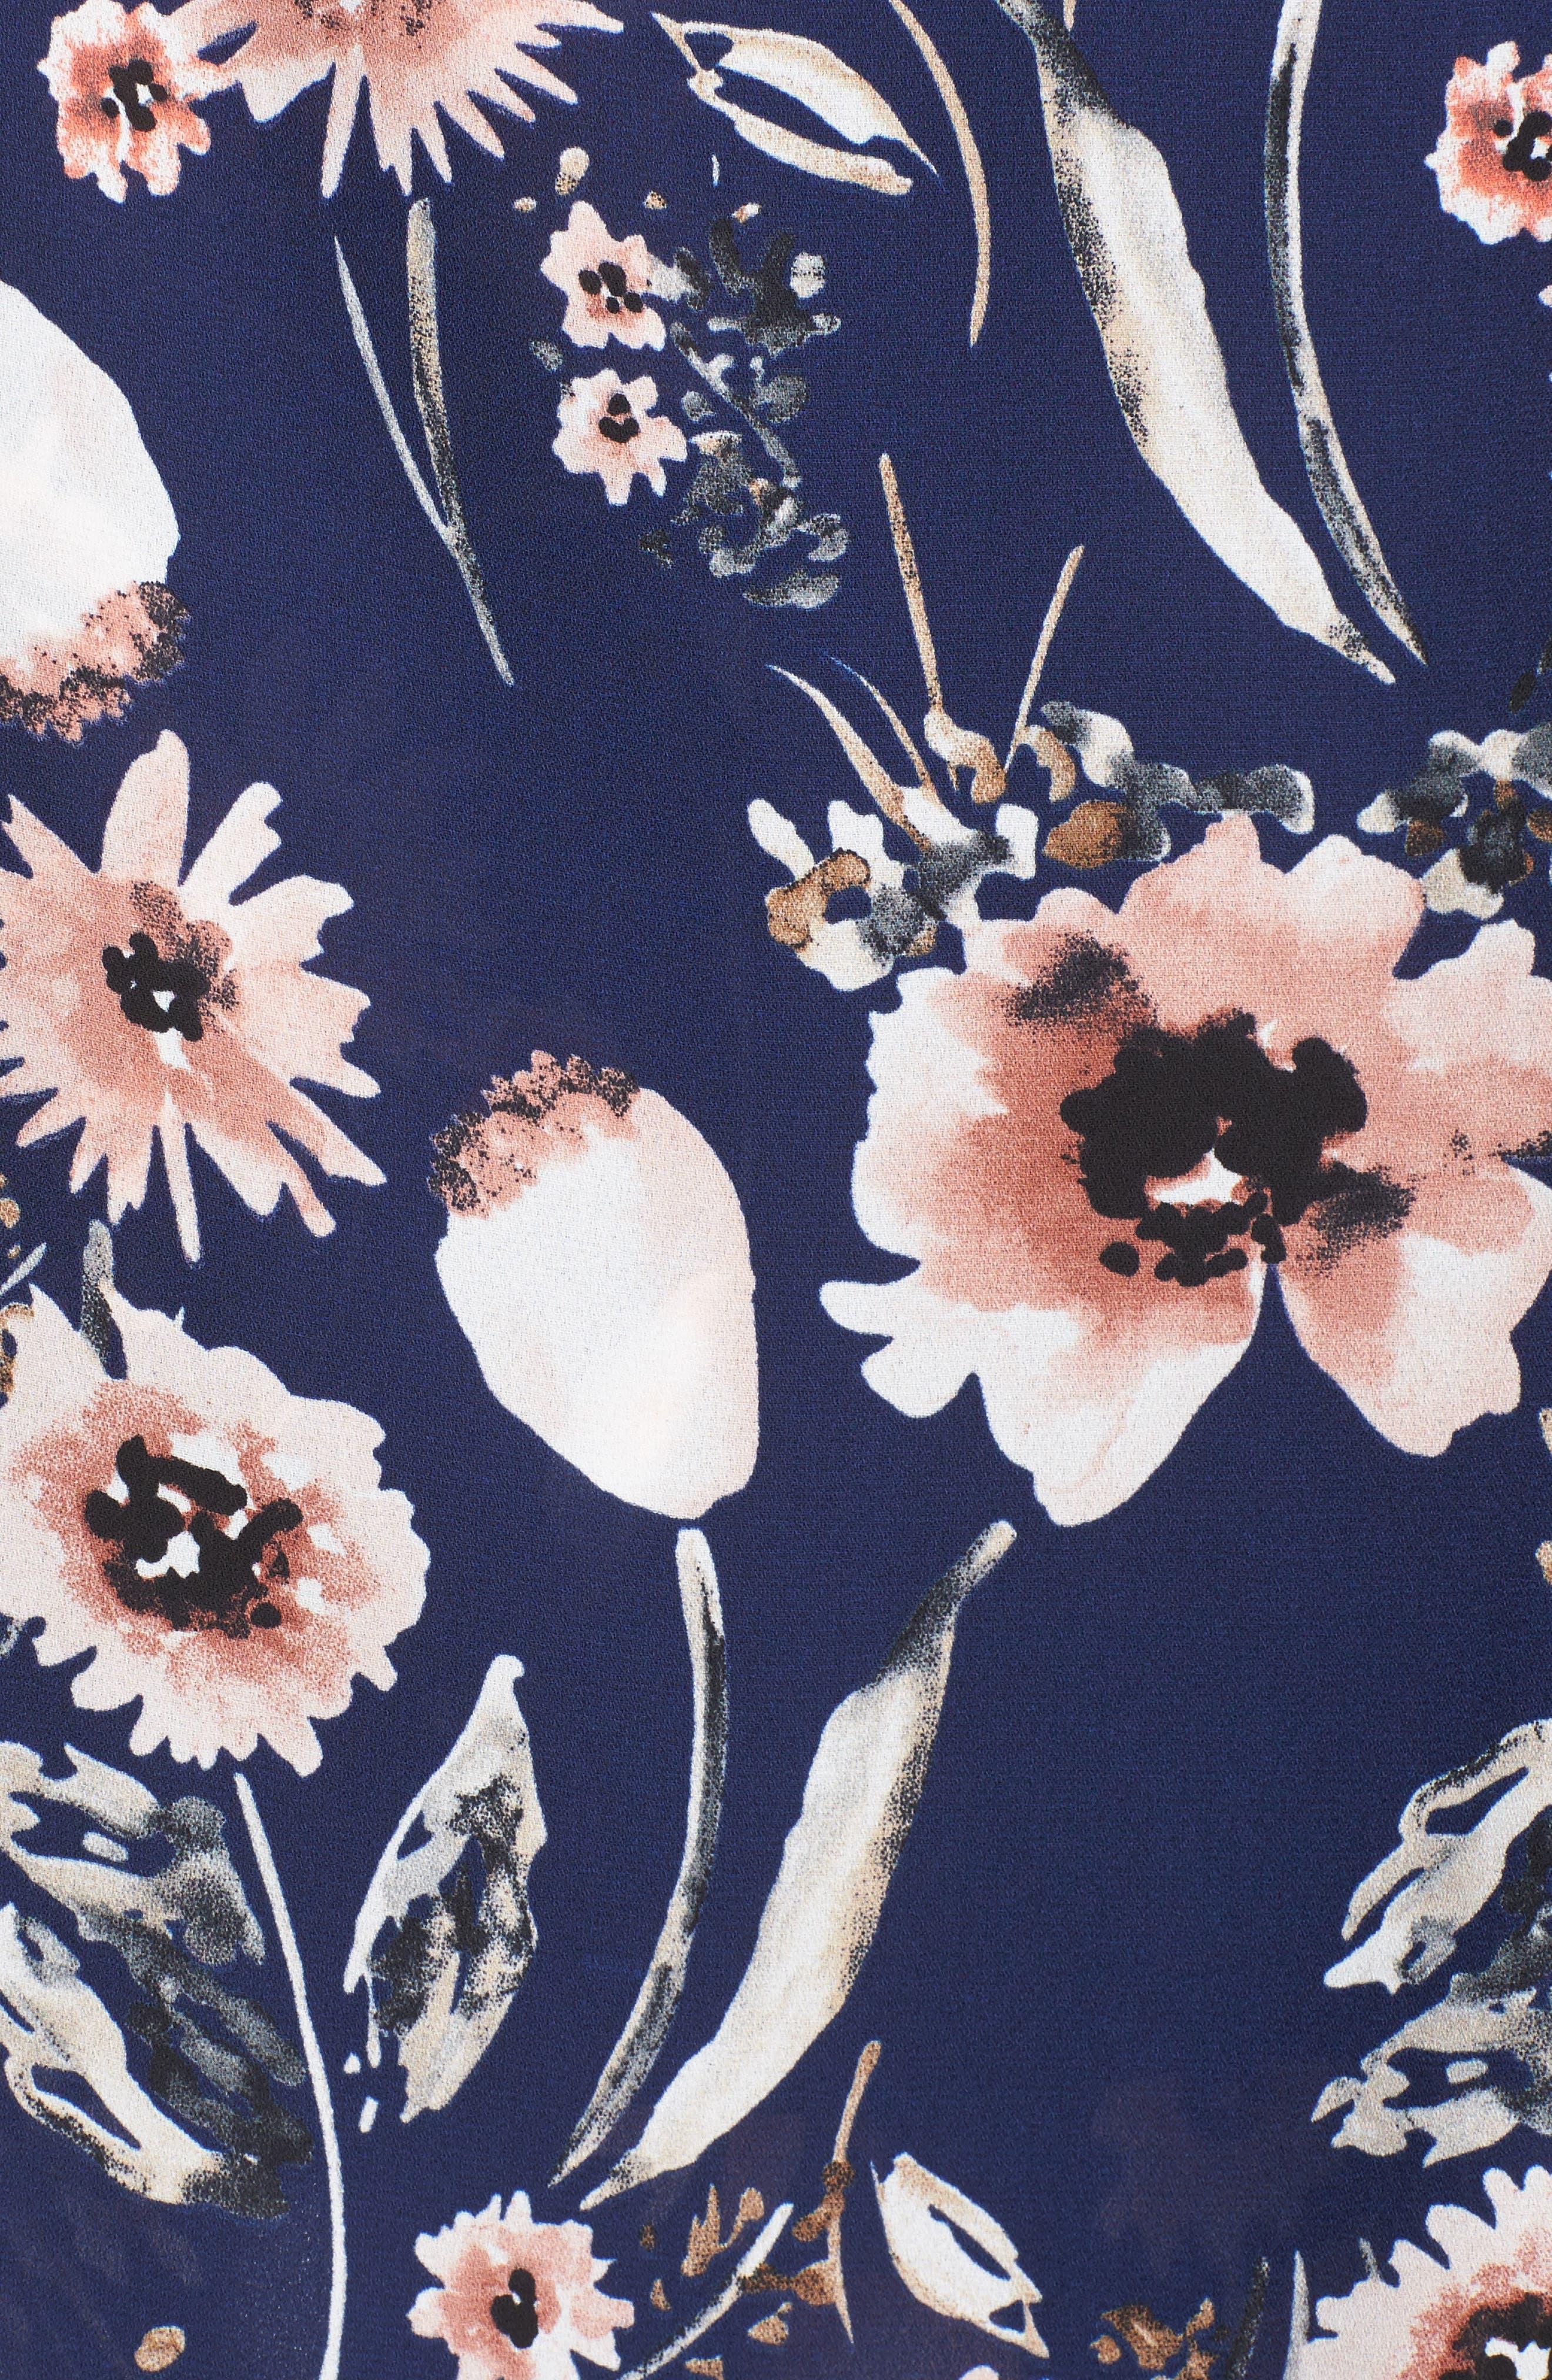 Wide Leg Pants,                             Alternate thumbnail 5, color,                             Navy Medieval Multi Floral